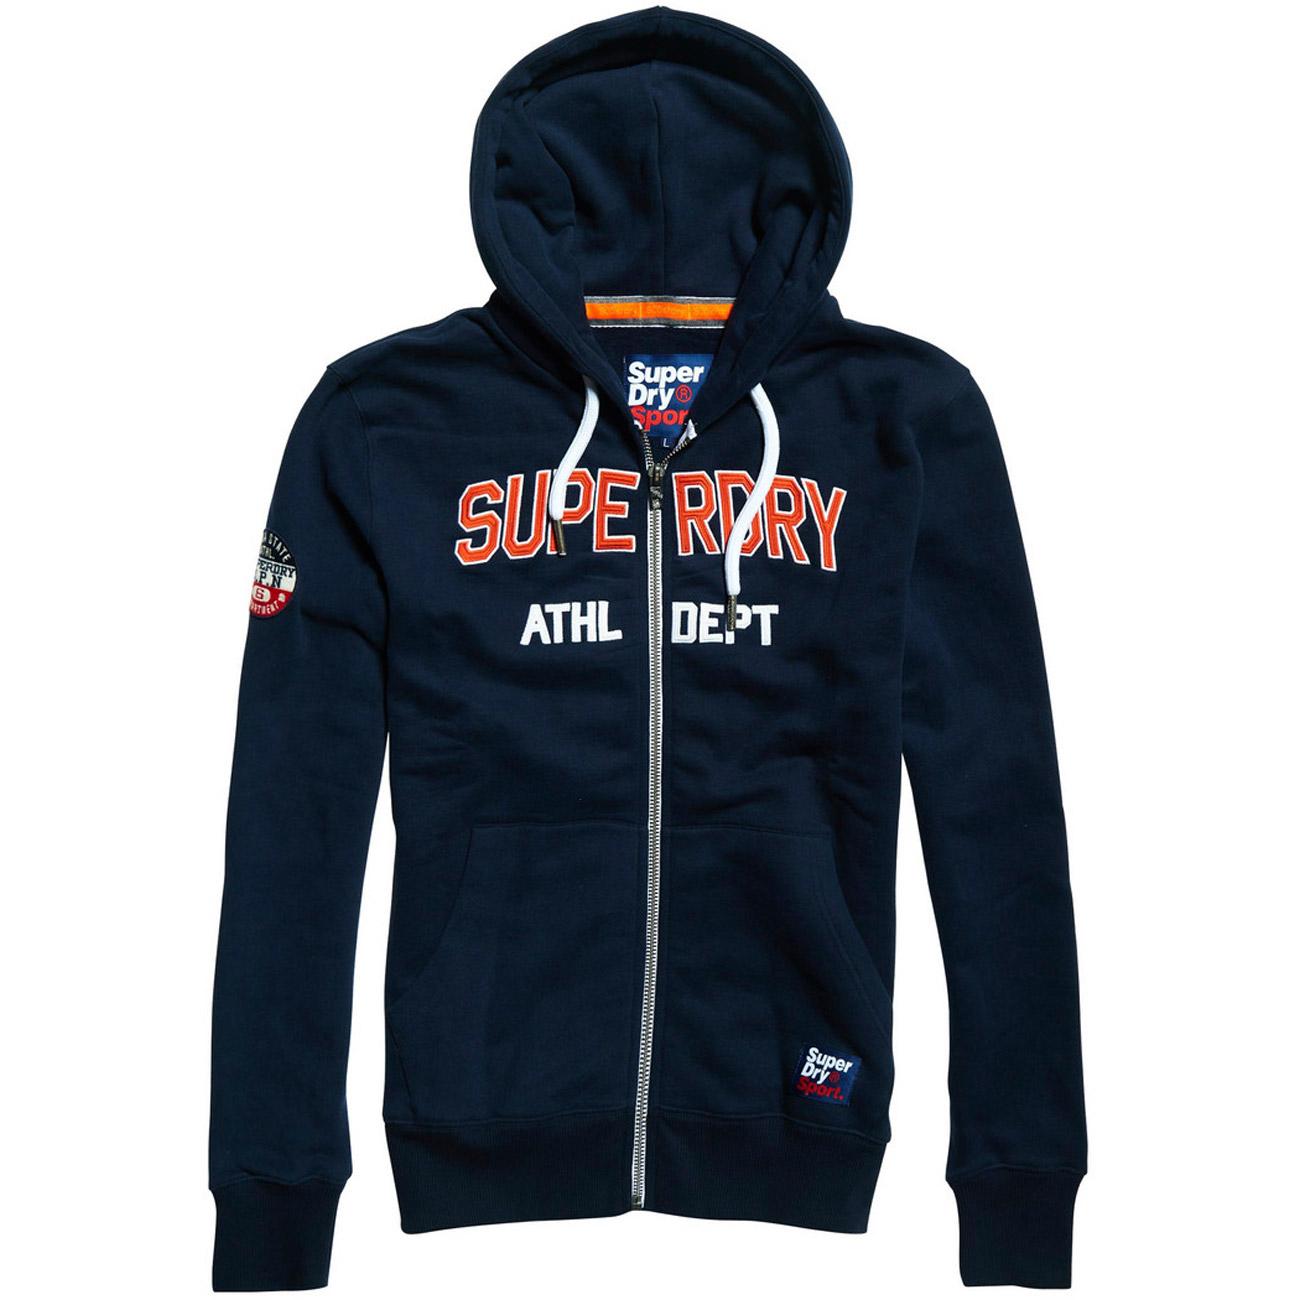 premium selection 2e7b5 17019 Superdry Herren Akademie Sport Applique Pullover Hoodie, Blau